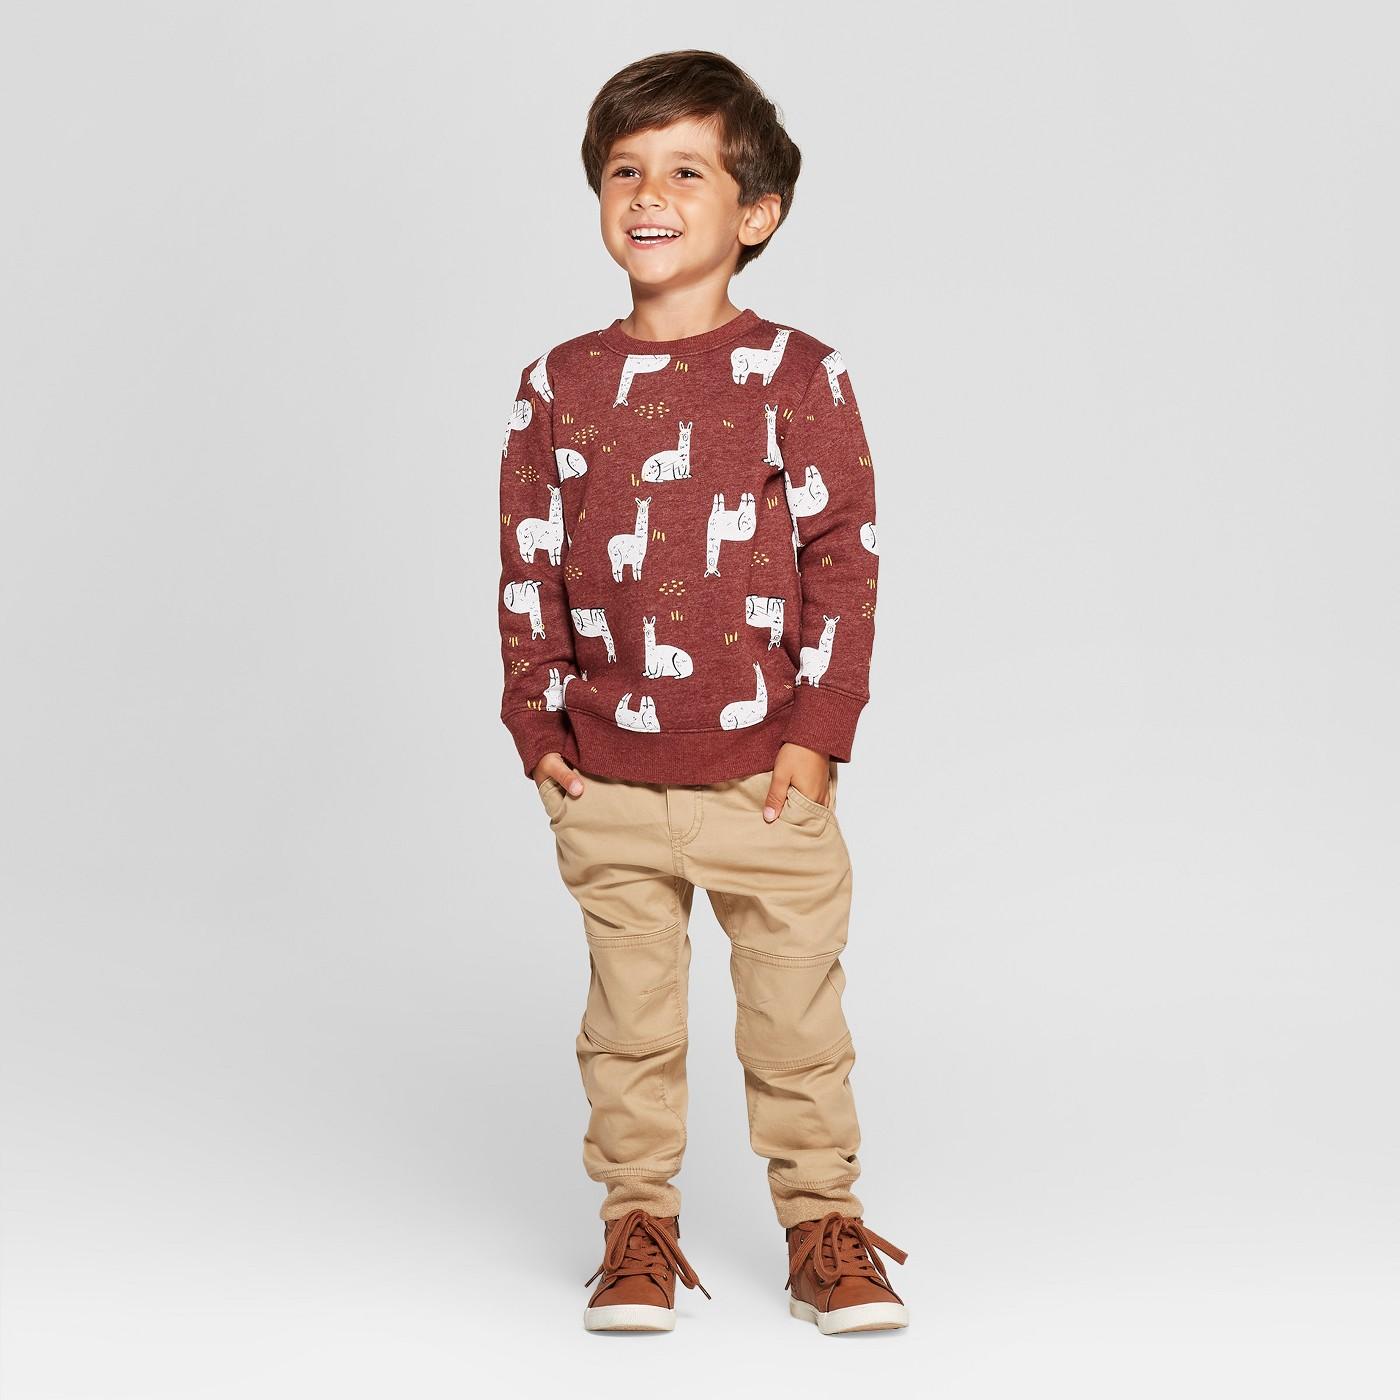 Toddler Boys' All Over Llama Print Fleece Crew Sweatshirt - Cat & Jack™ Maroon - image 3 of 3